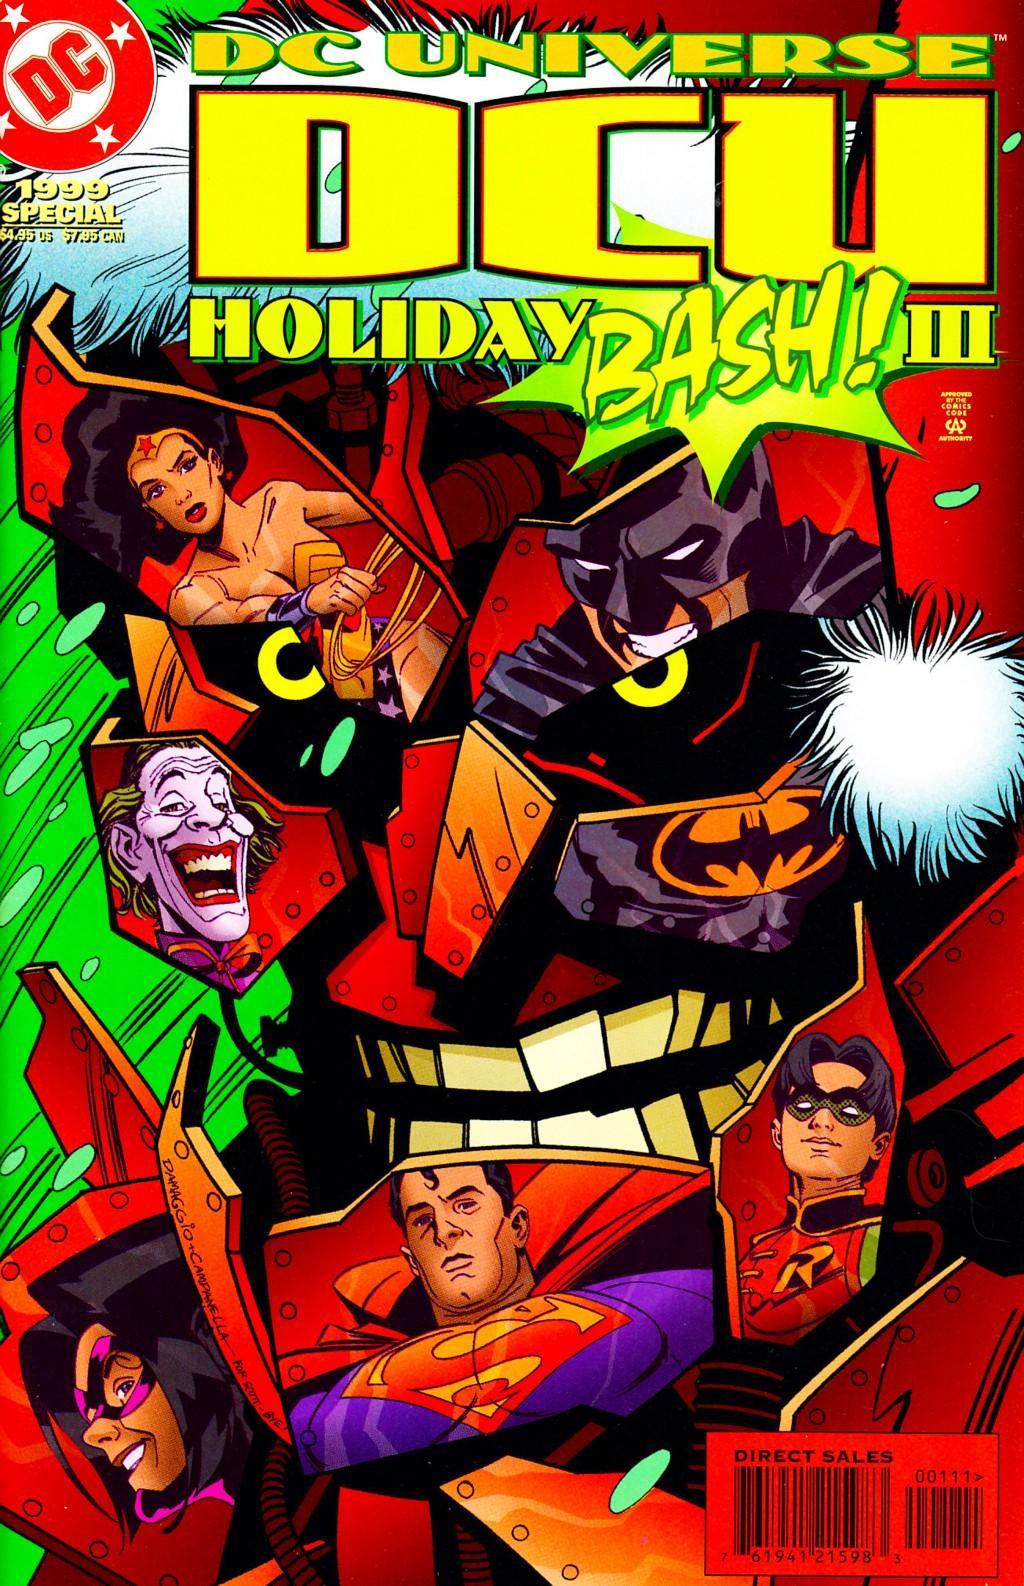 DC Universe Holiday Bash 3 Page 1